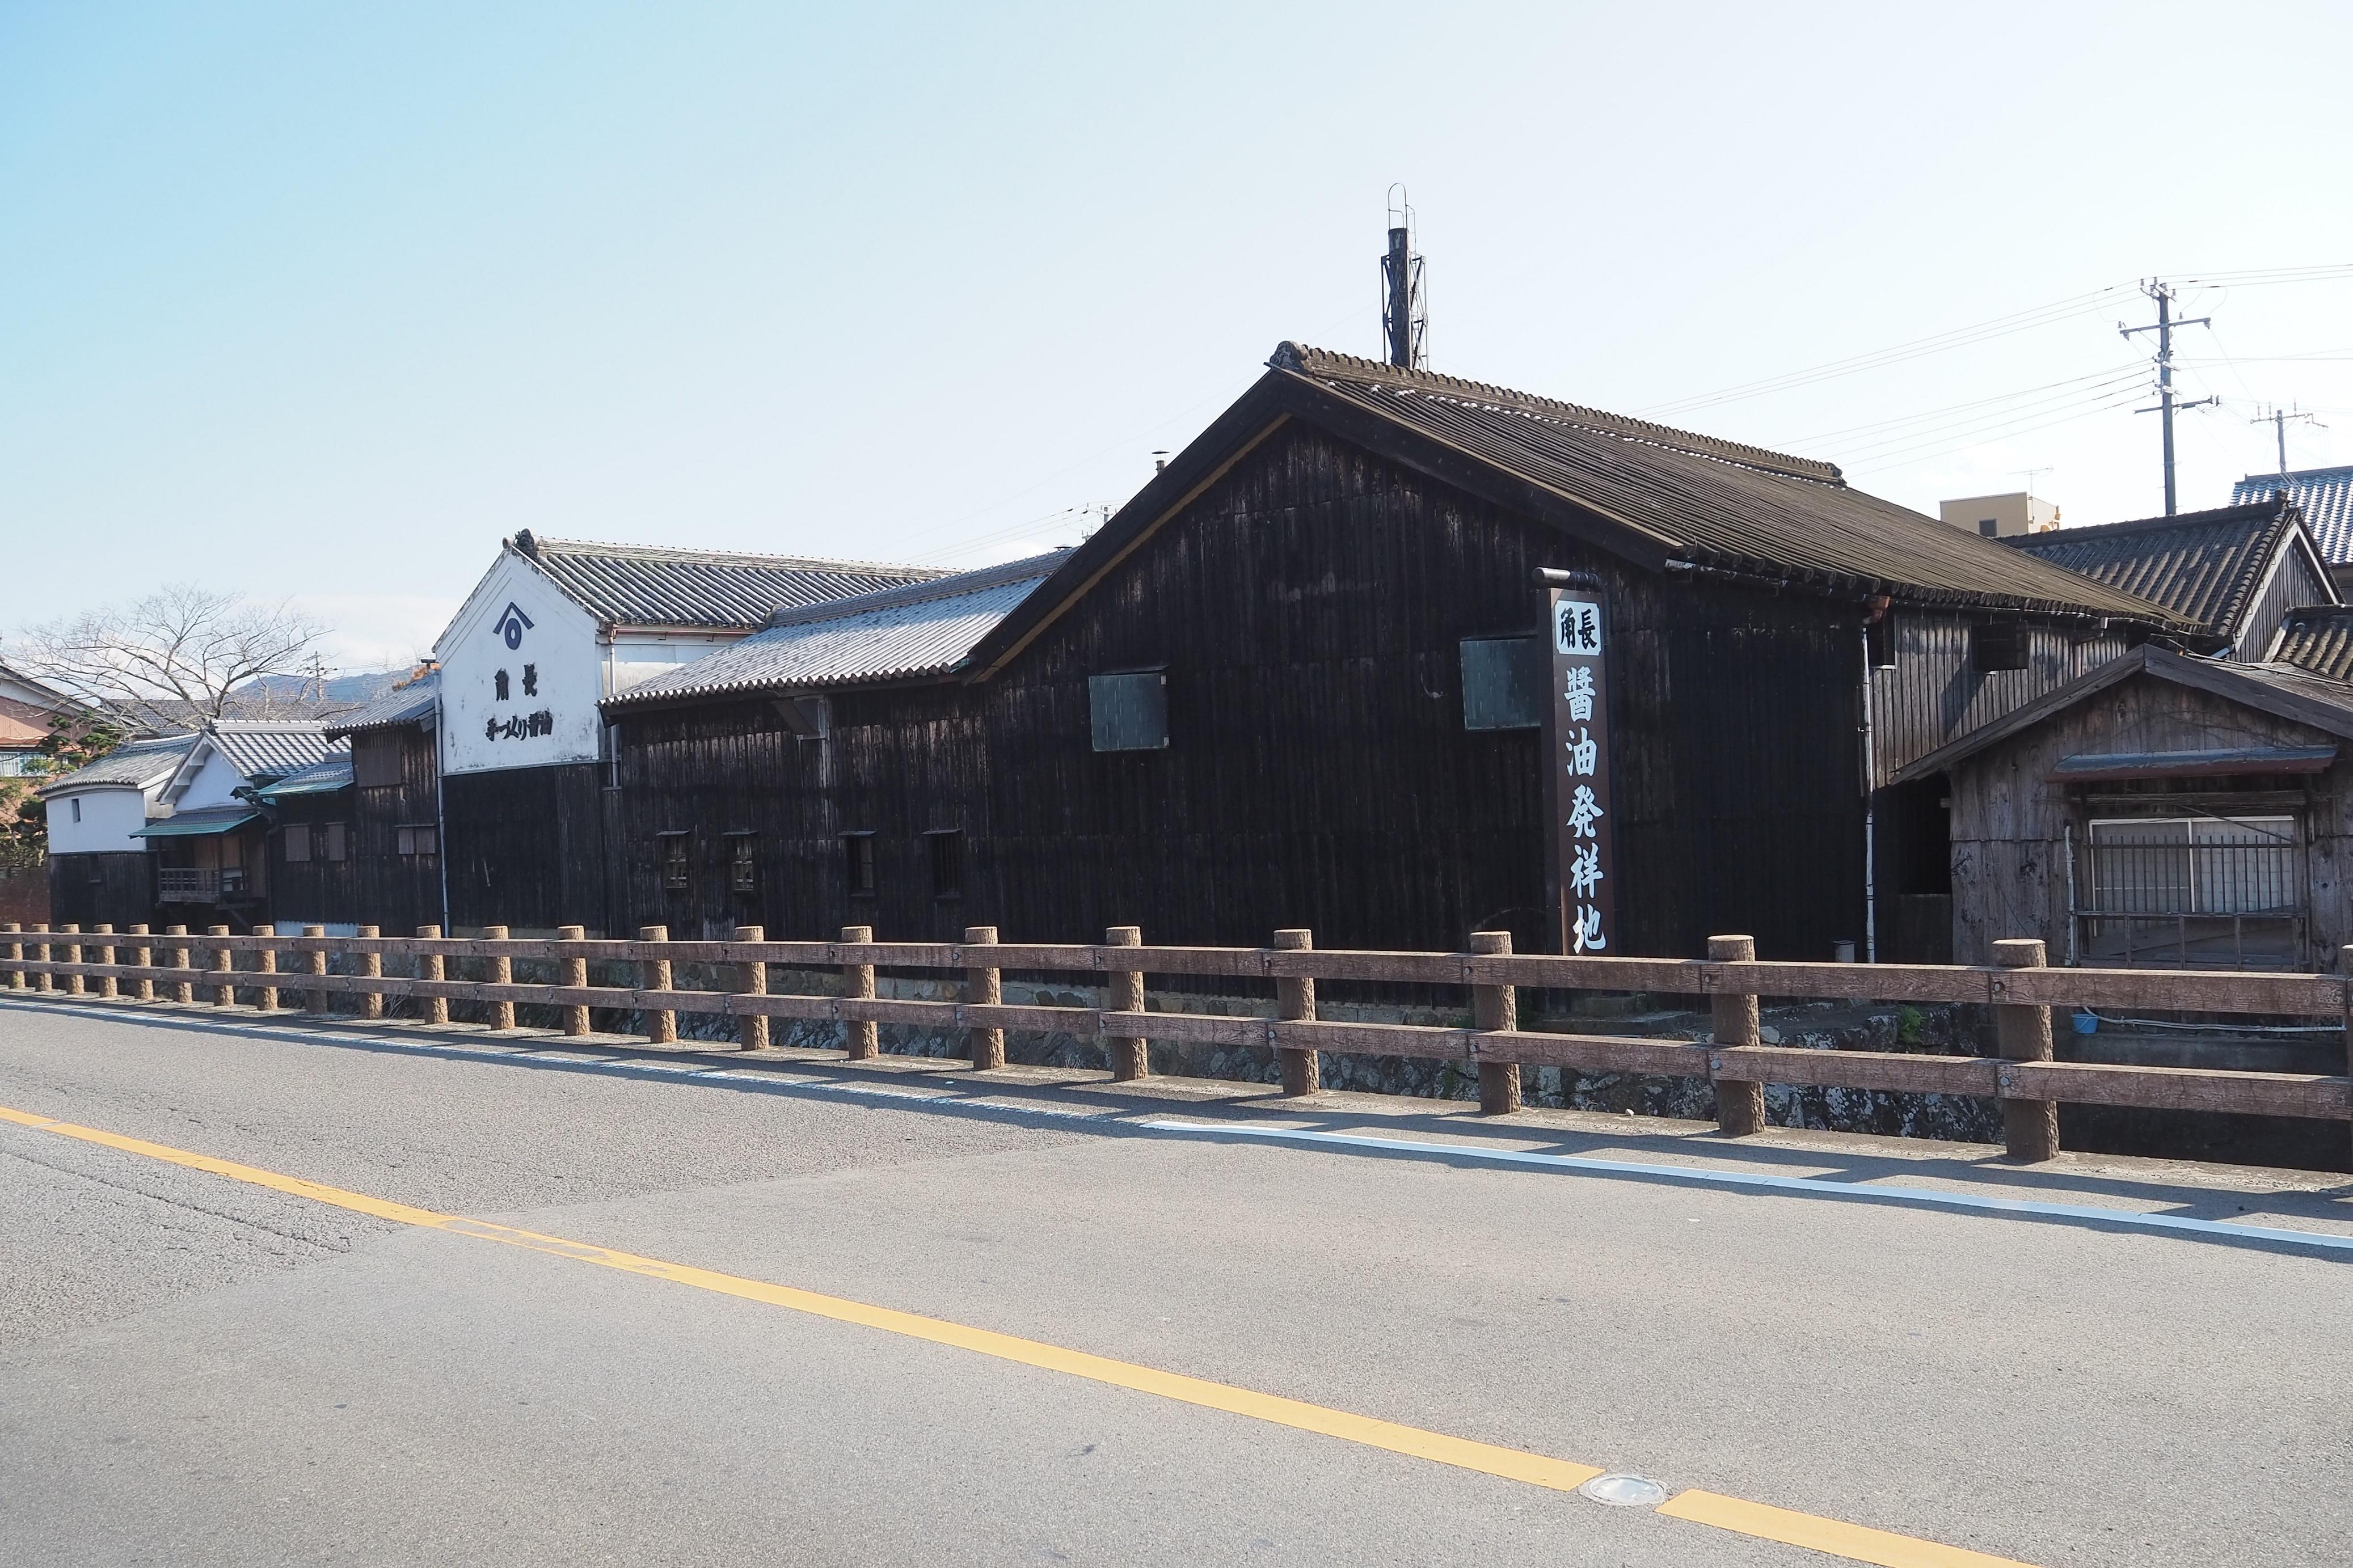 harleydavidson-motorcycle-touring-blog-wakayama-yuasatown-soysauce-kadochou-factory.jpg